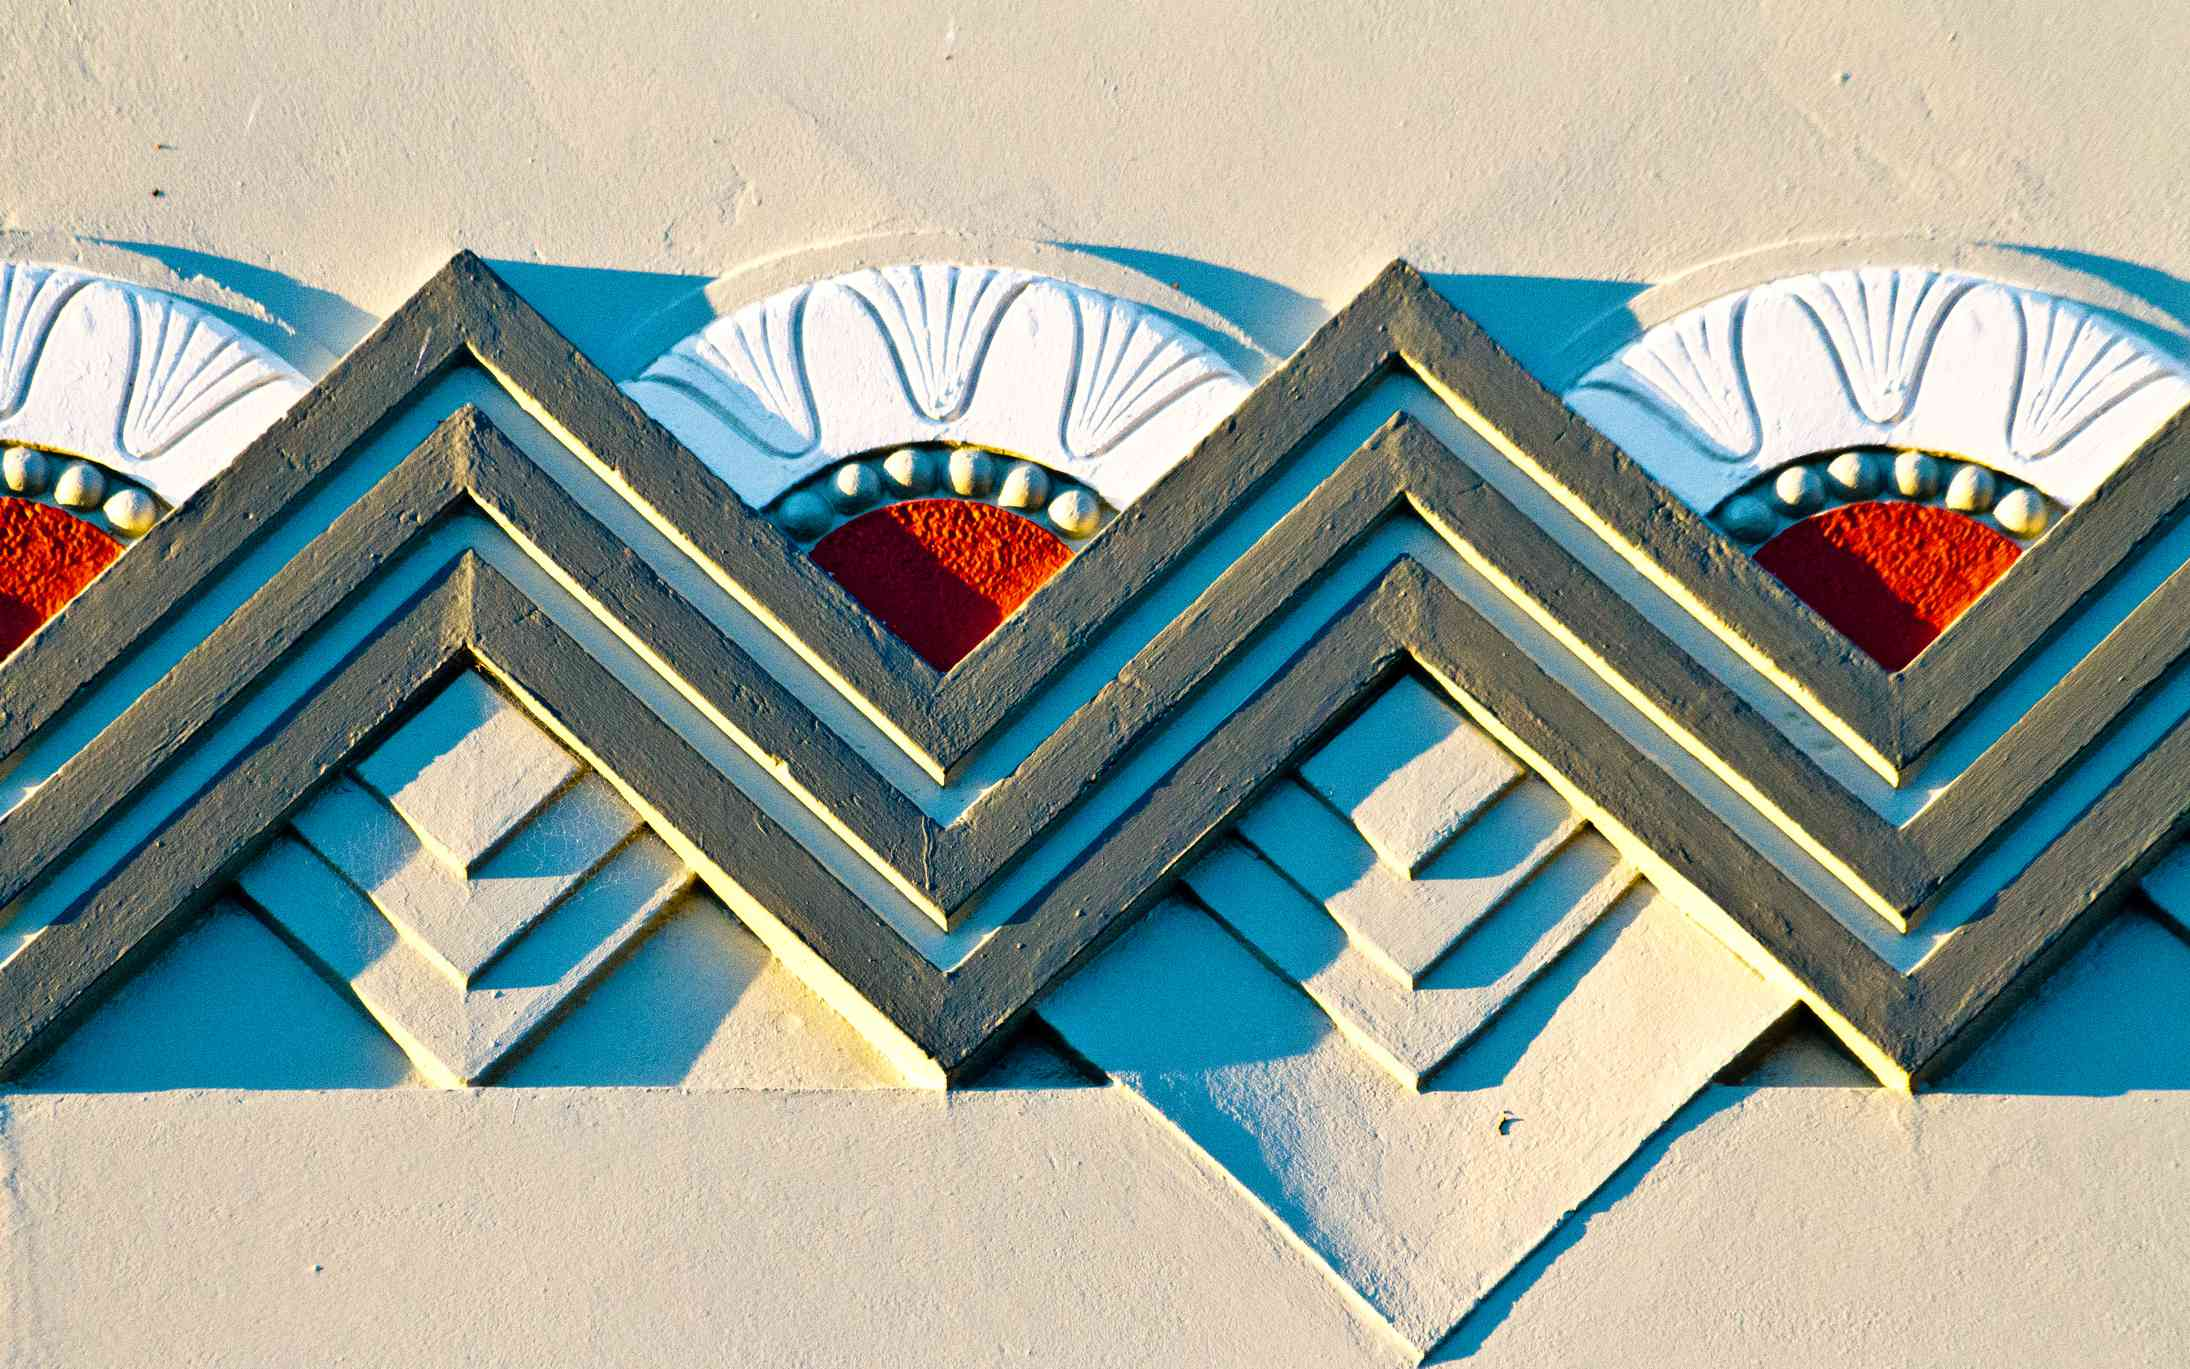 zig-zagging Art Deco design on a wall